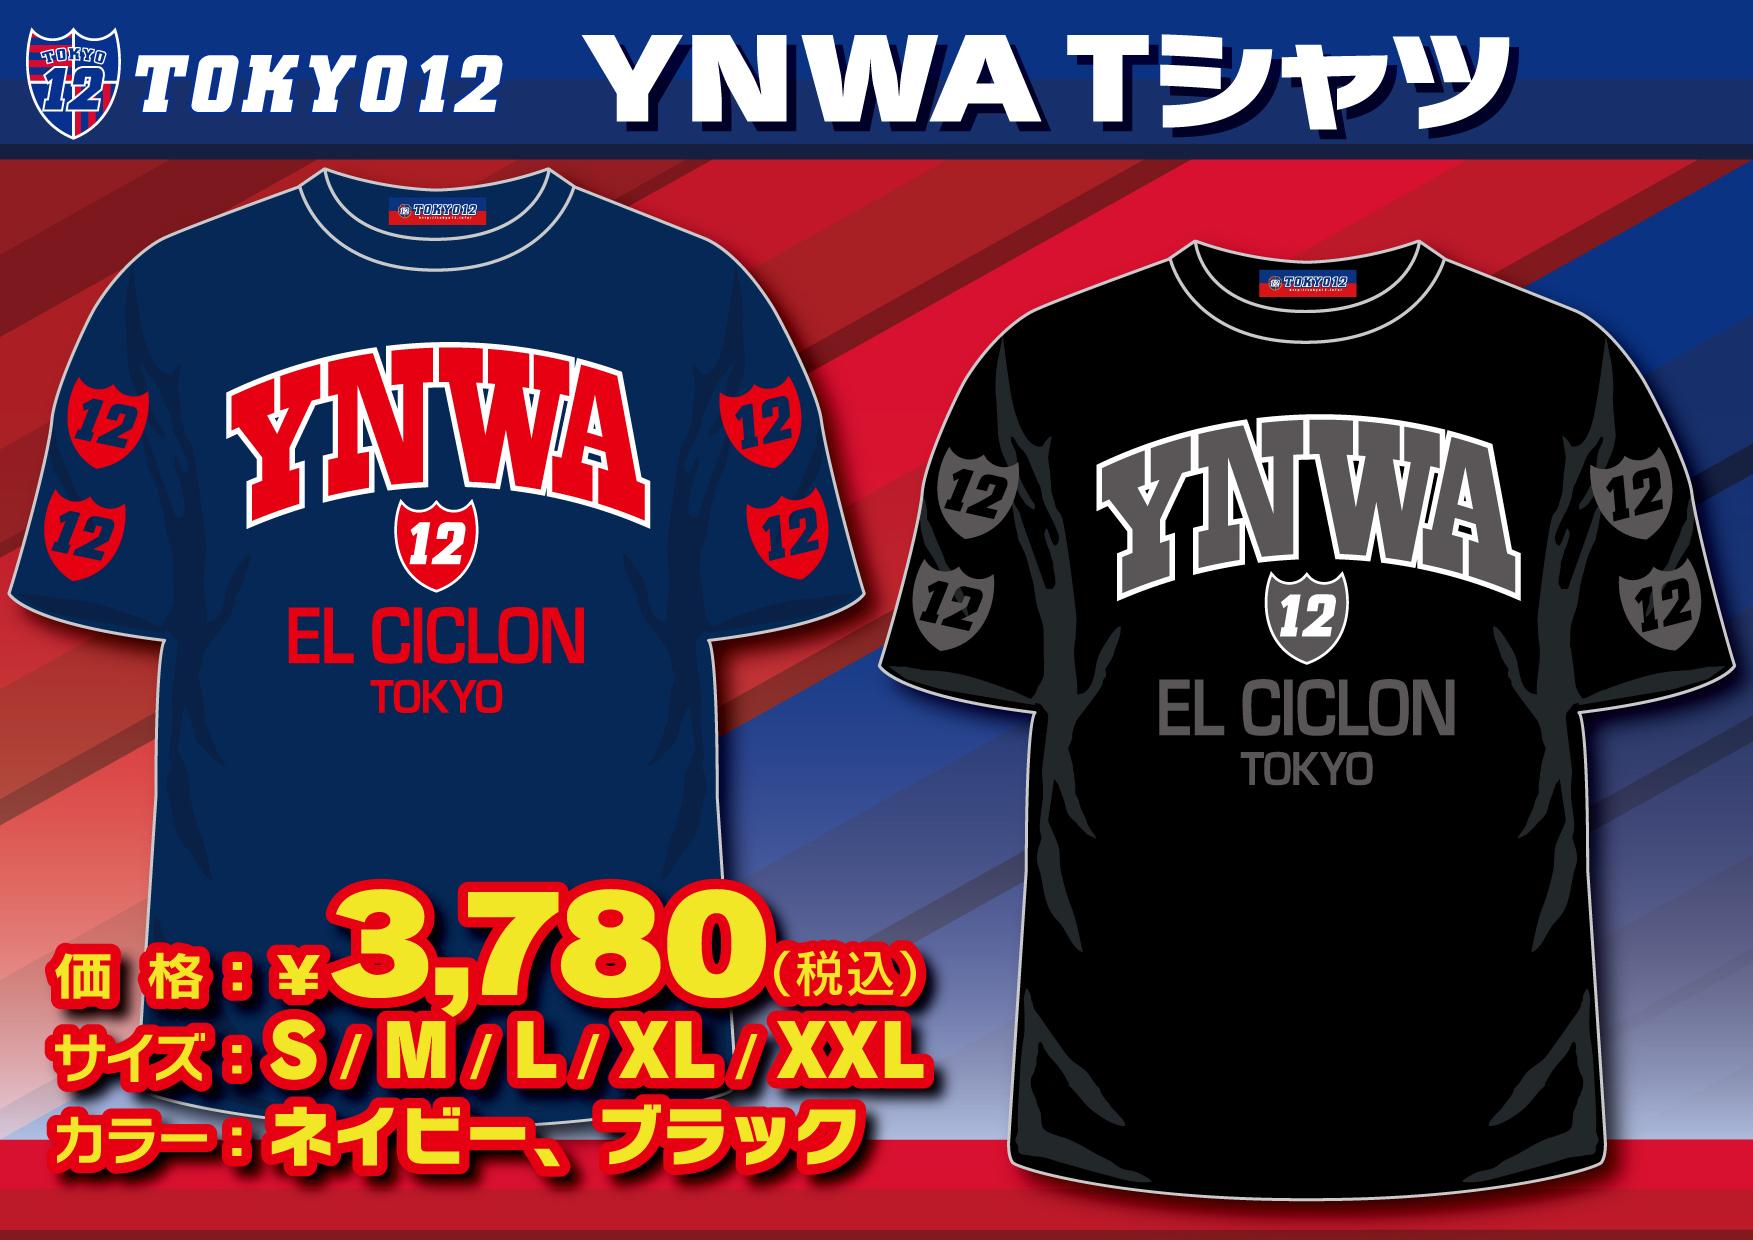 YNWA12 Tシャツ